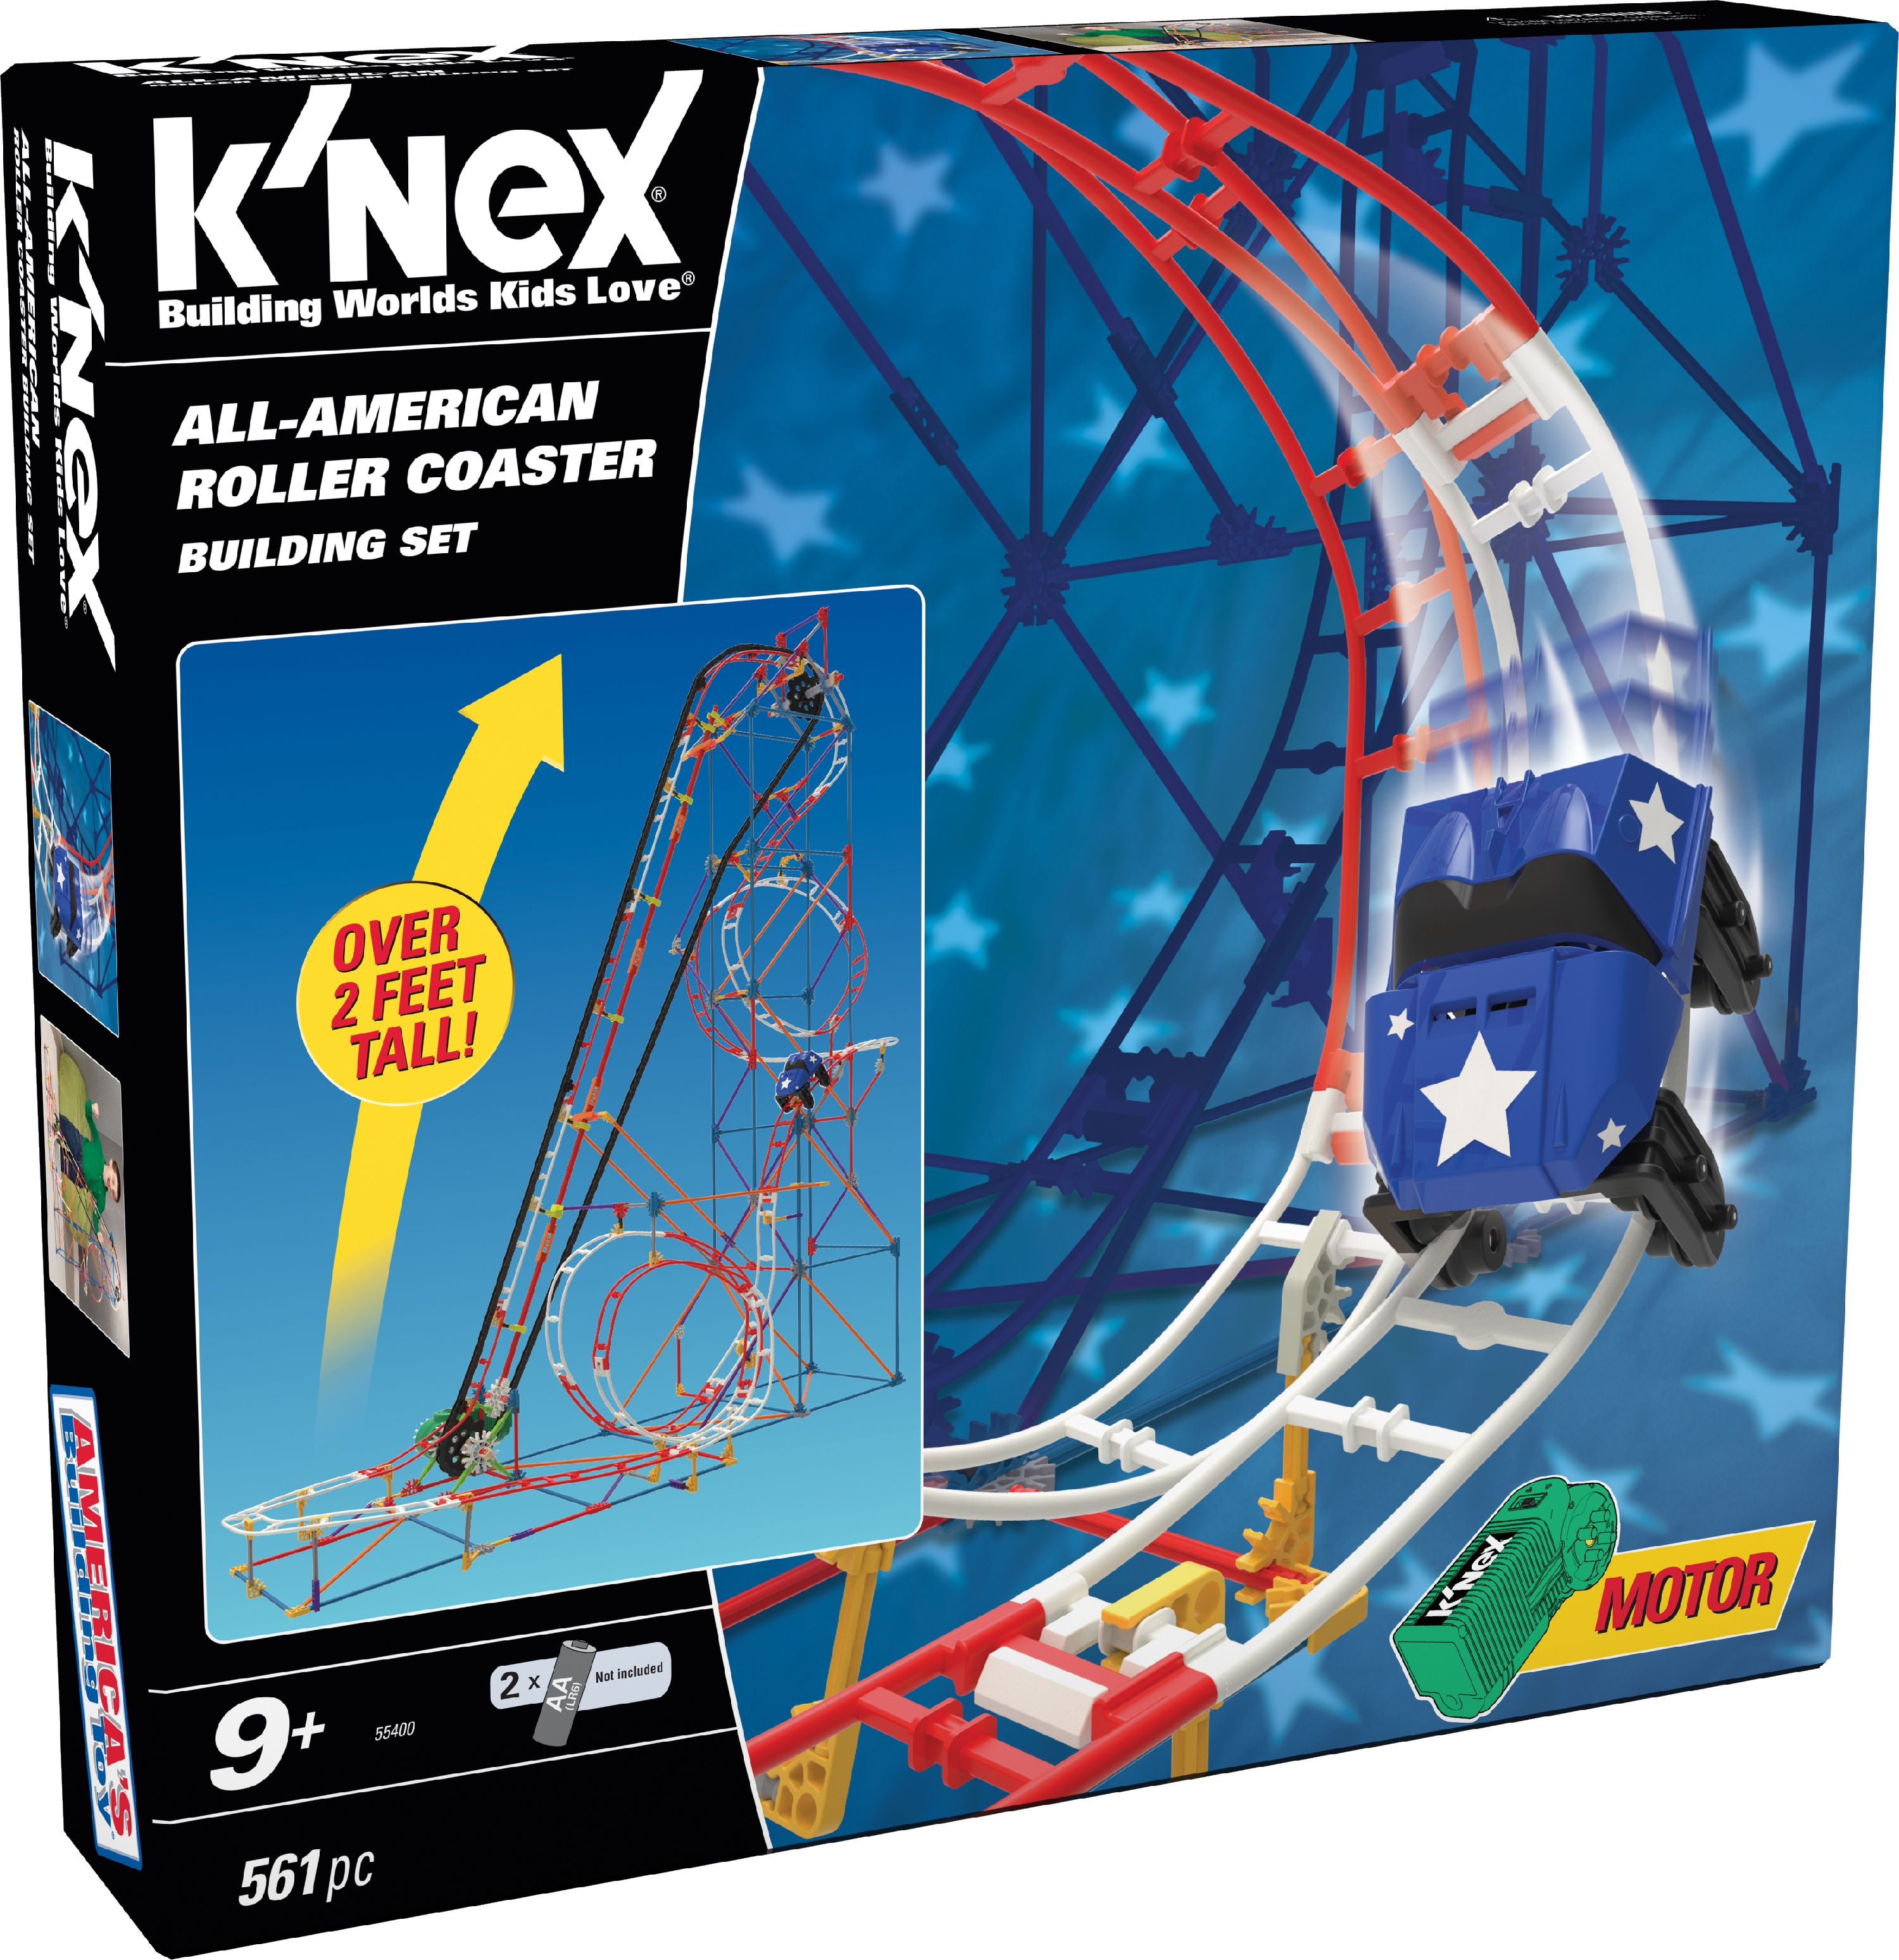 K'NEX ALL-AMERICAN ROLLER COASTER BUILDING SET